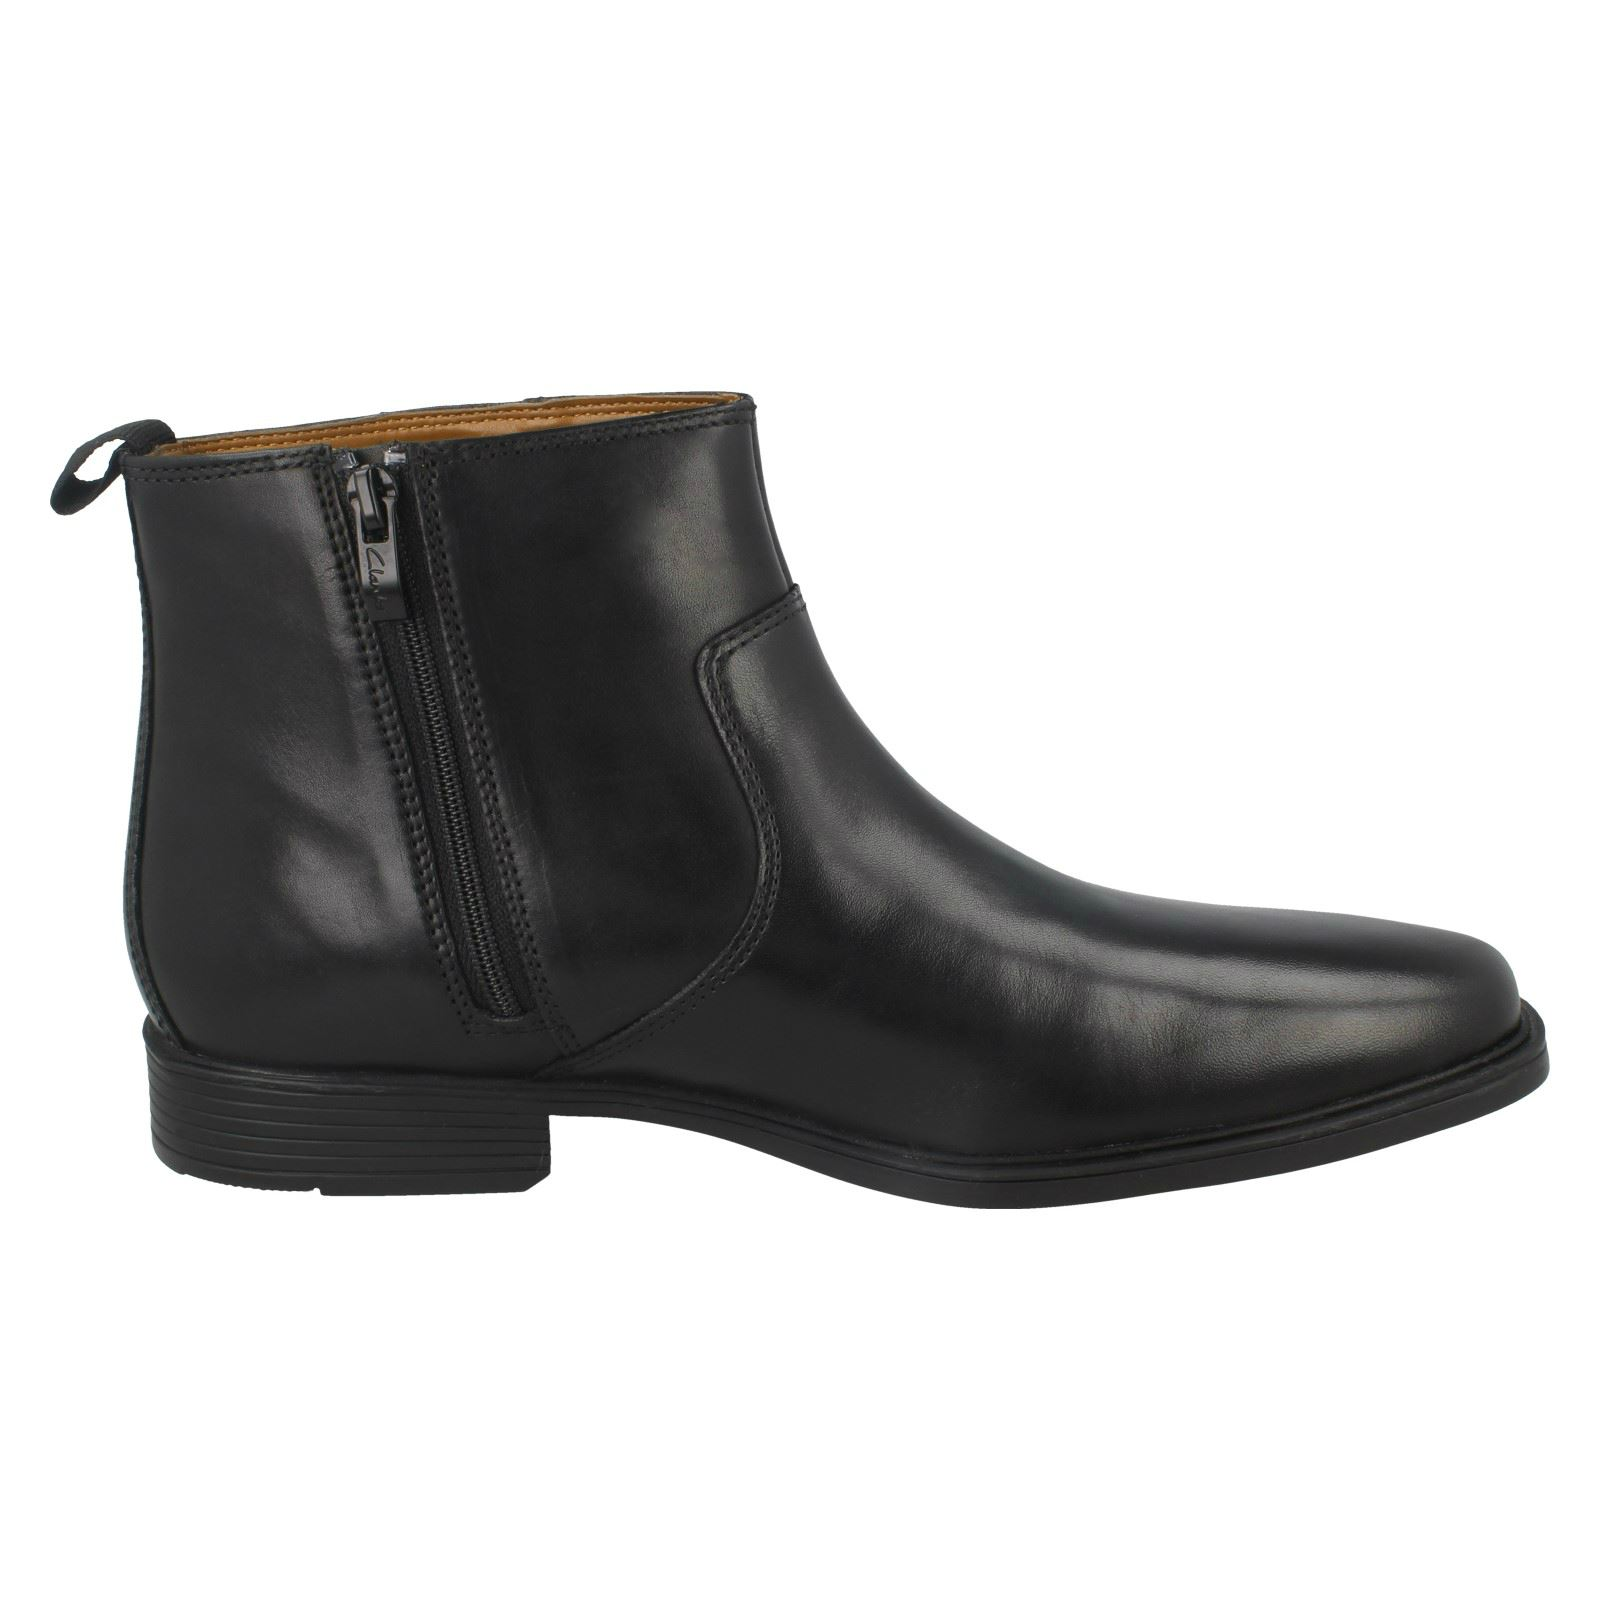 Mens-Clarks-Ankle-Boots-039-Tilden-Zip-039 thumbnail 7